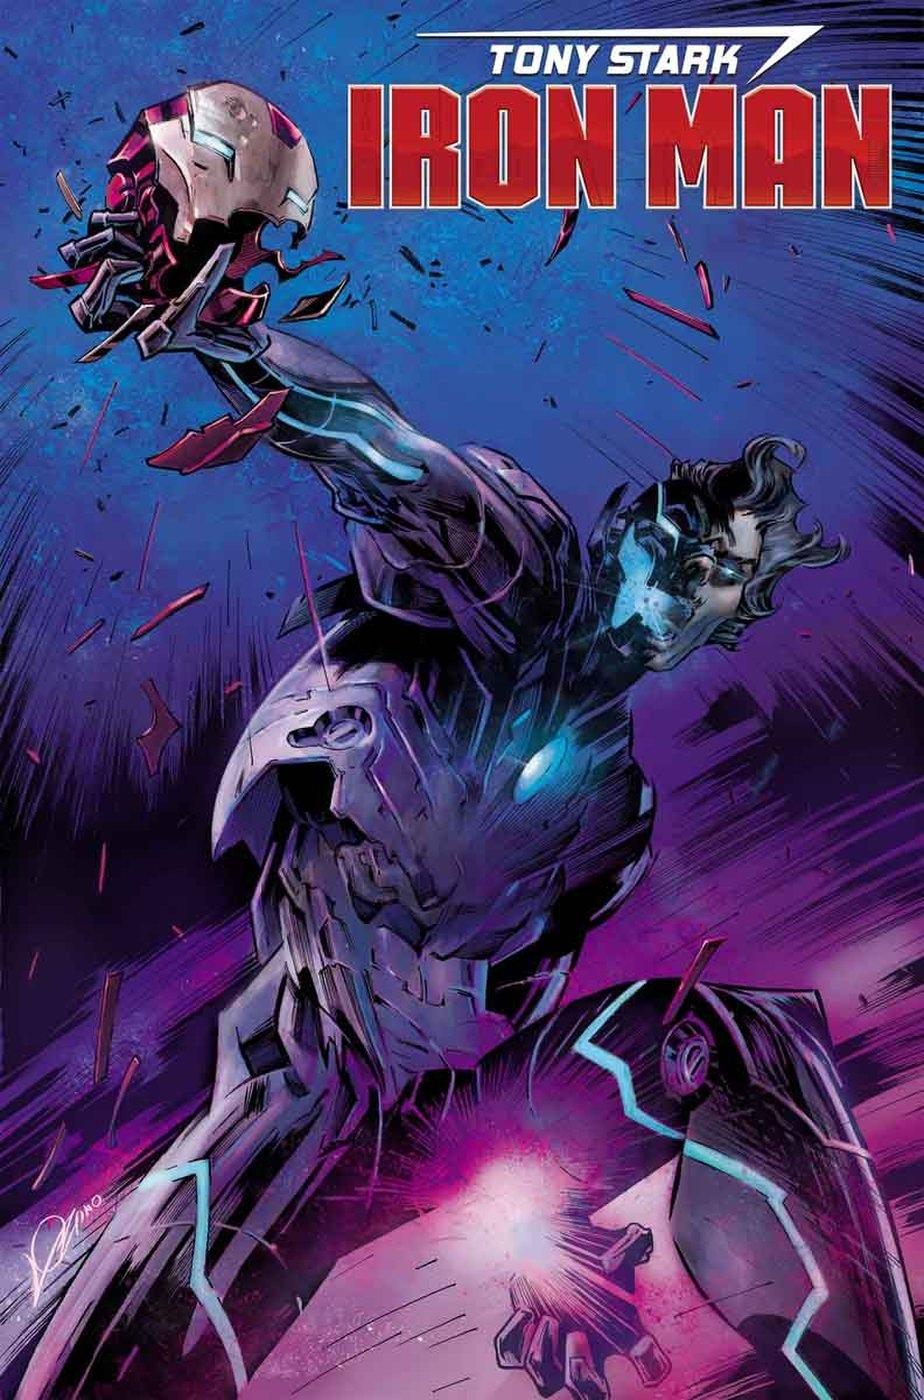 Marvel тизерит возвращение гибрида Хэнка Пима иАльтрона [обновлено] | Канобу - Изображение 3